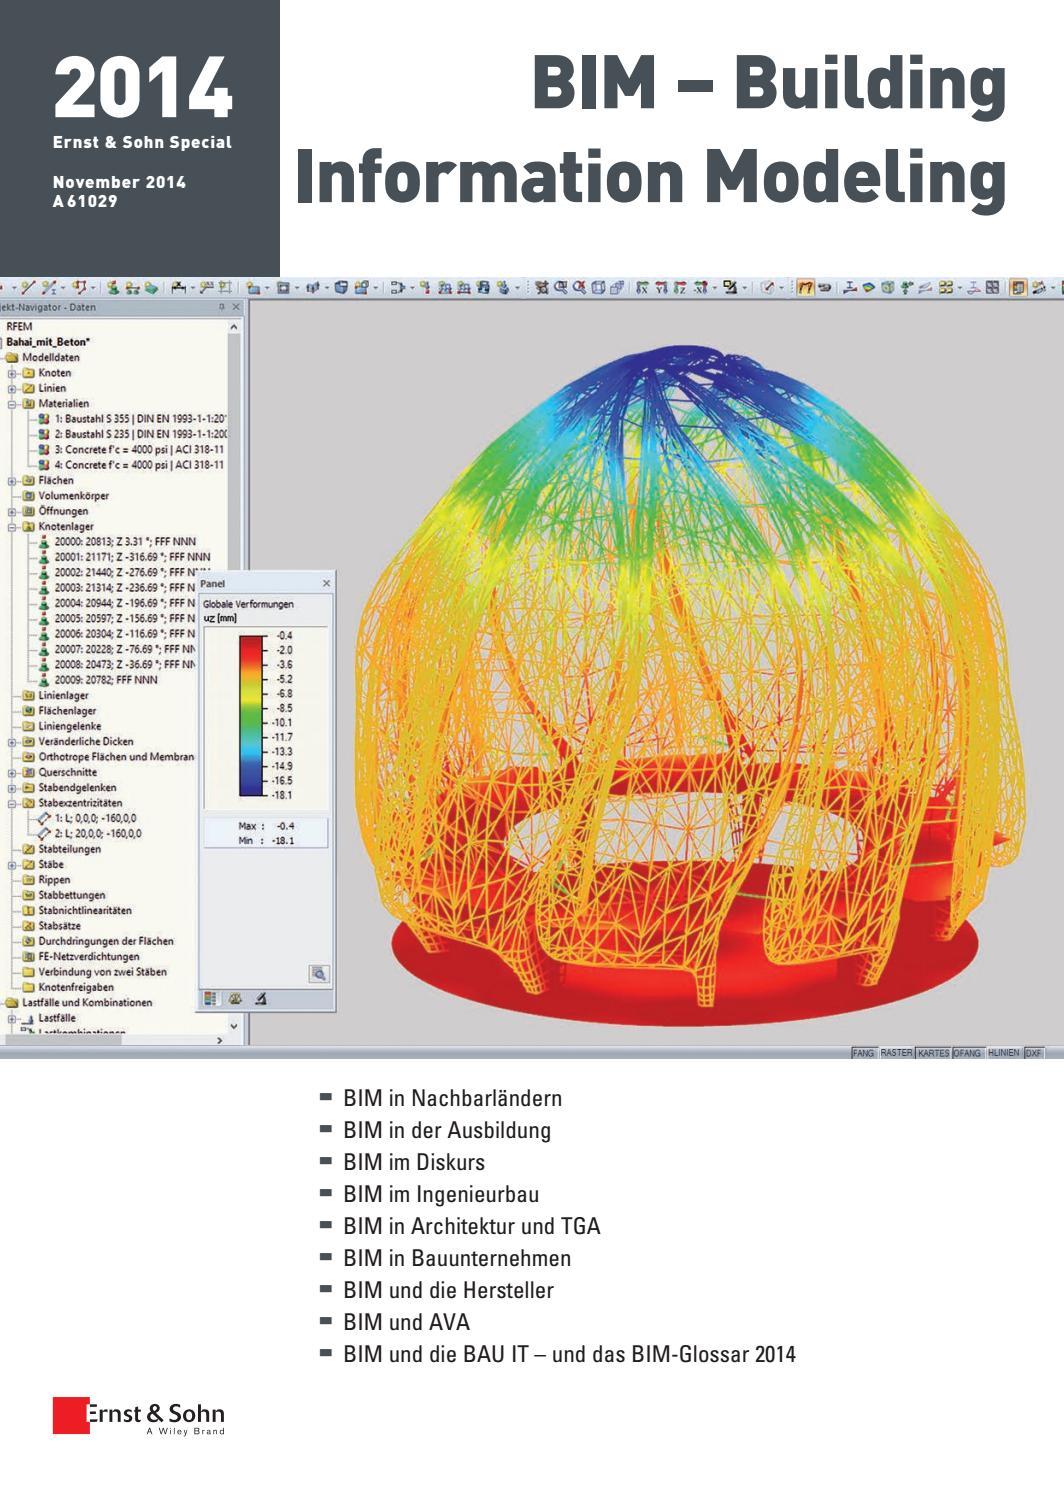 Ernst & Sohn Sonderheft BIM Building Information Modeling 2014 by Ernst &  Sohn - issuu